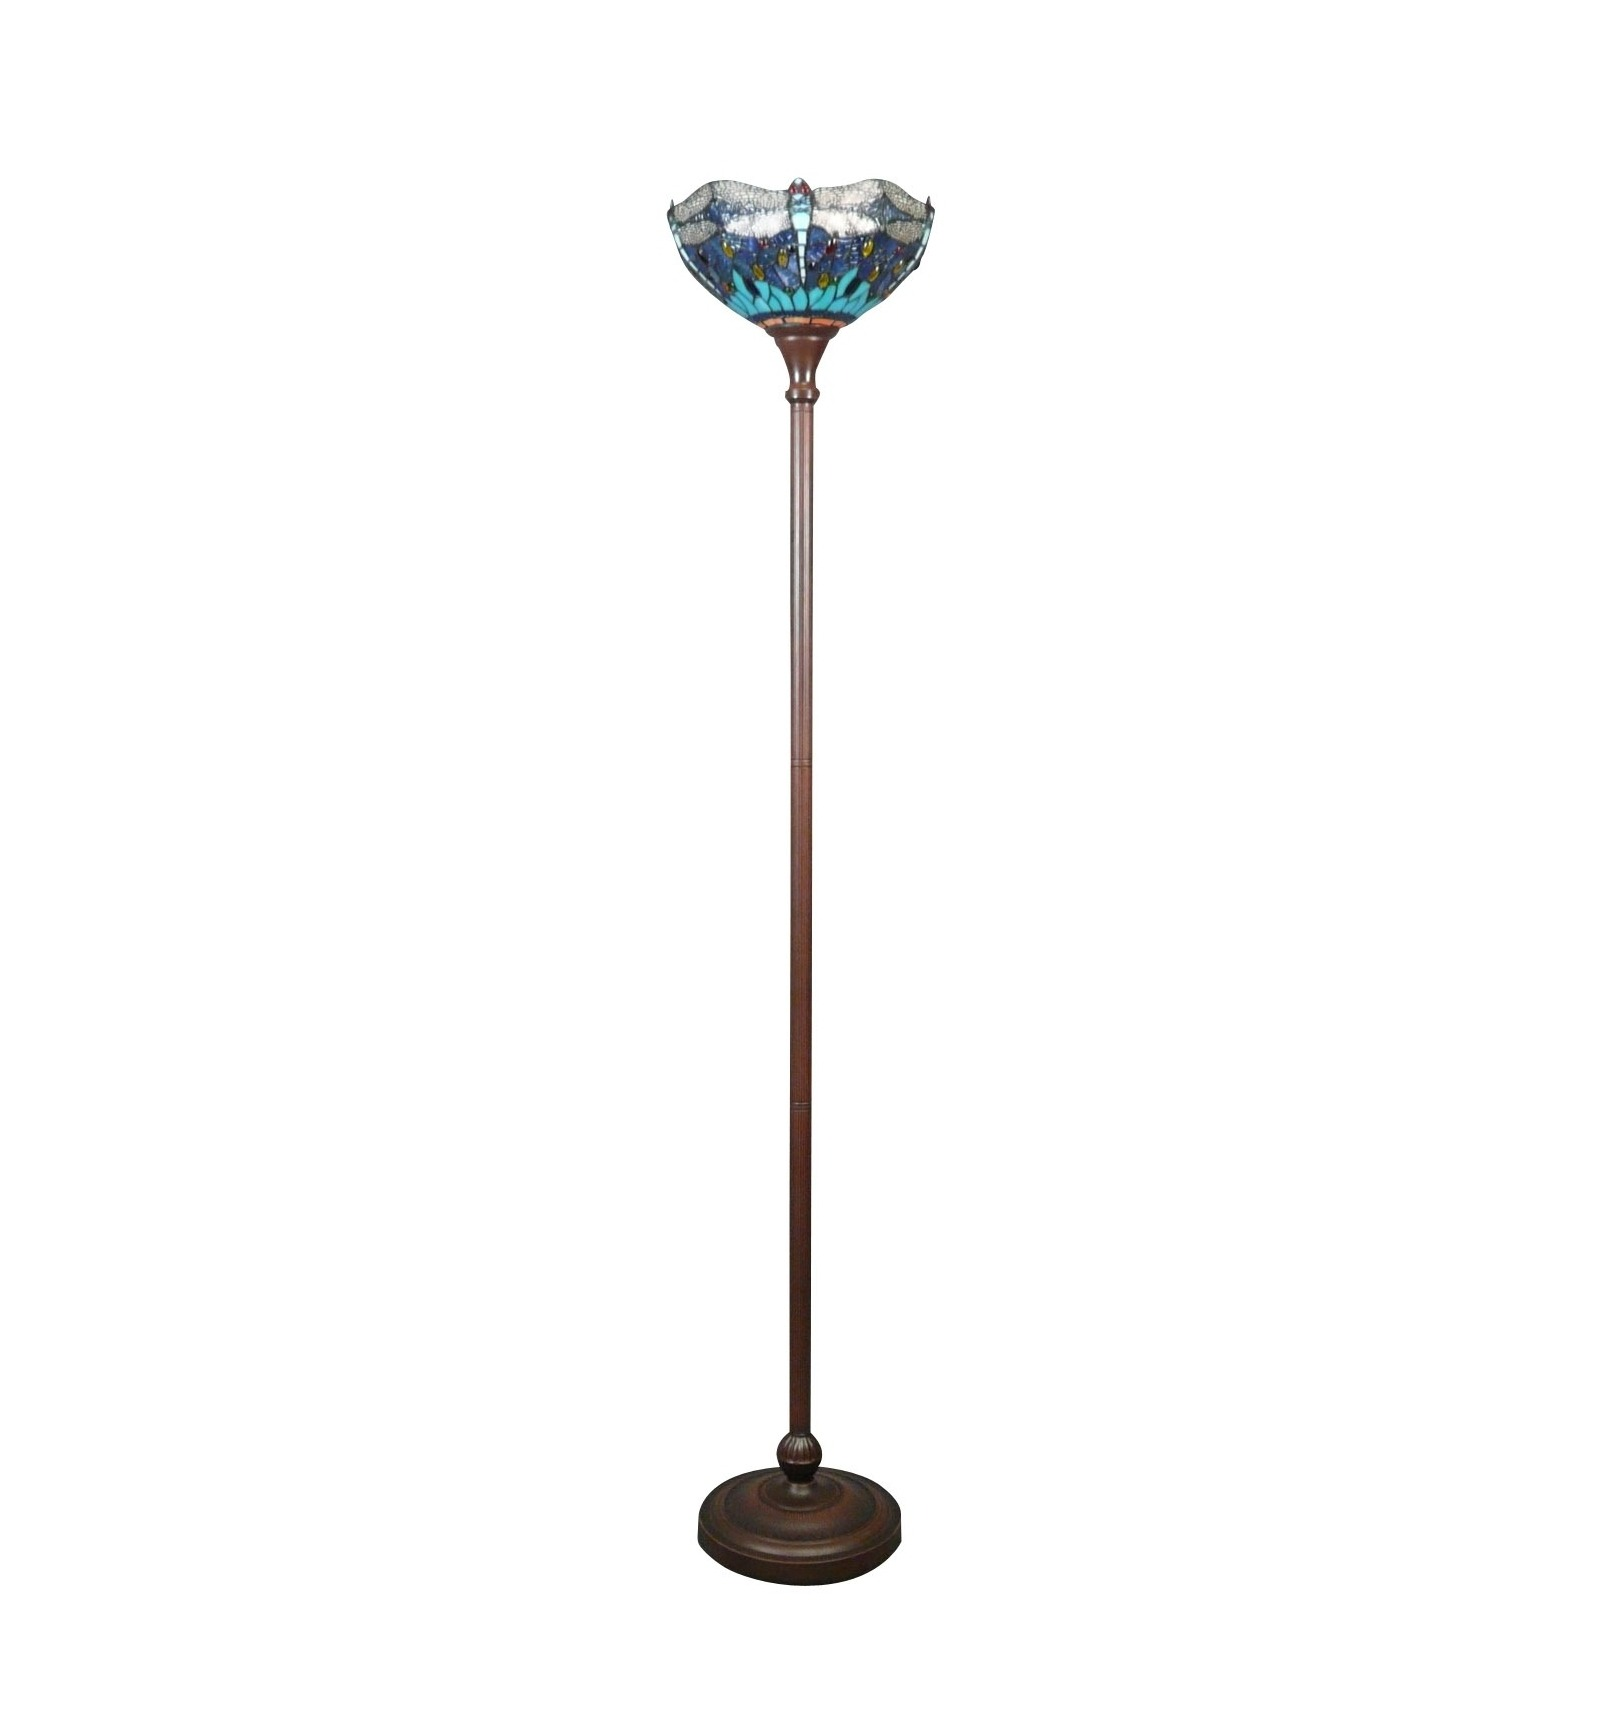 tiffany stehlampe libellen blau und gr n tiffany lampen. Black Bedroom Furniture Sets. Home Design Ideas